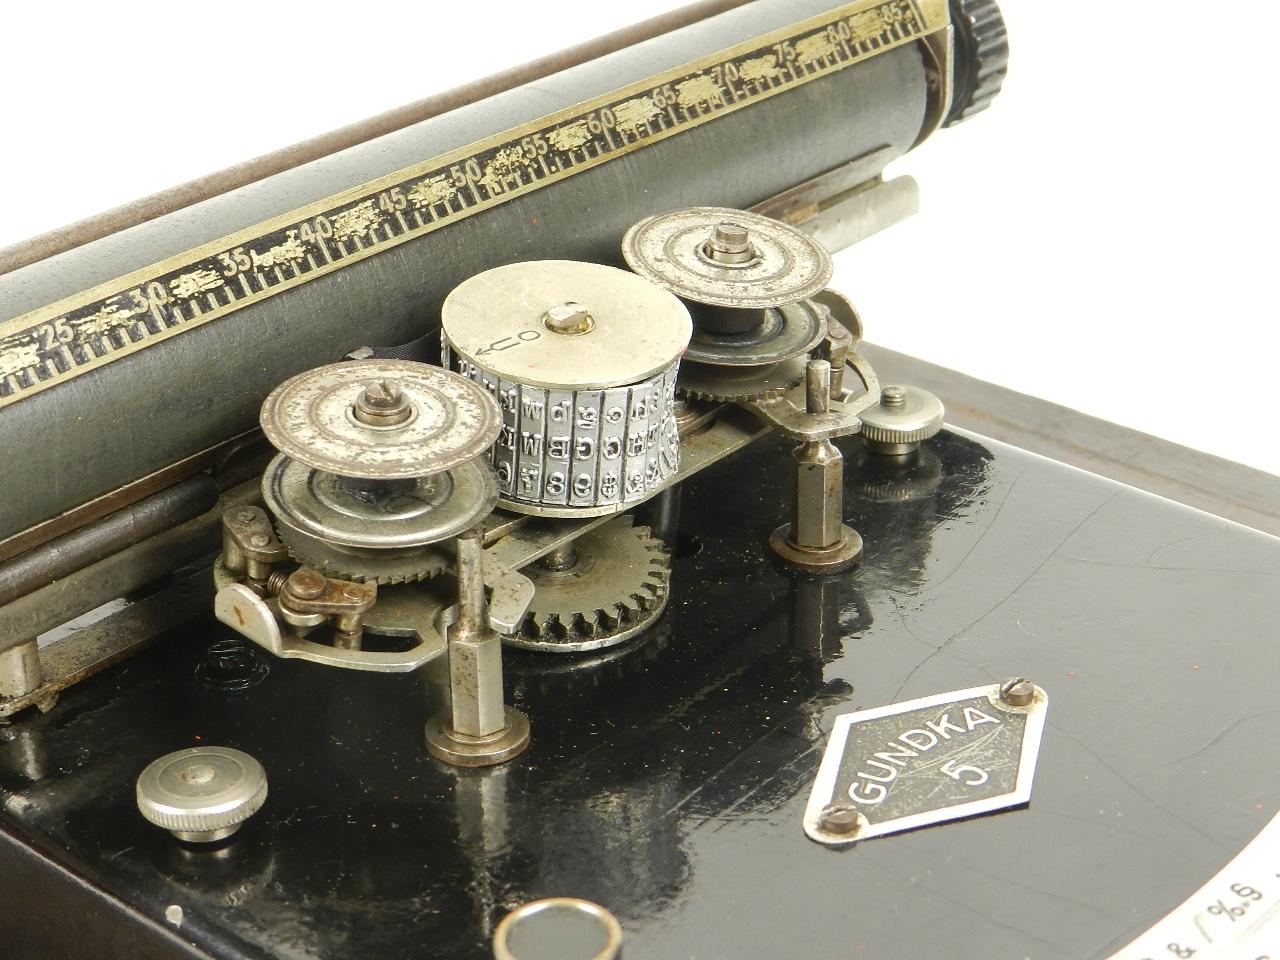 Imagen GUNDKA Nº5 AÑO 1924 28477